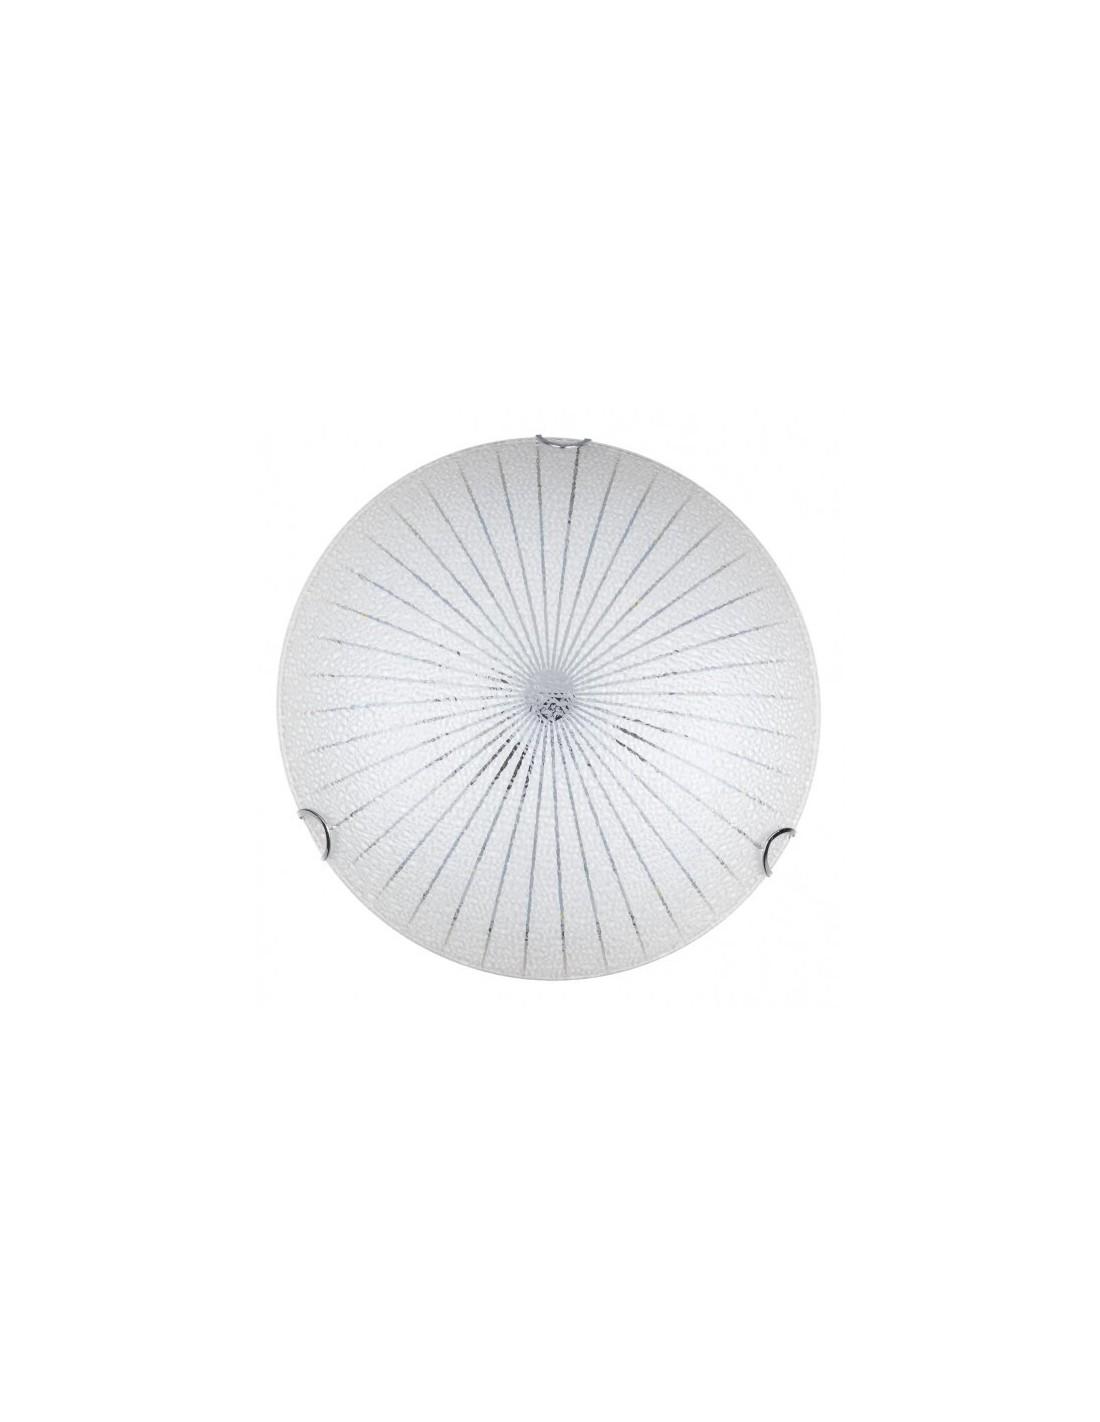 acheter lampes pour enfants mariposa 19153000. Black Bedroom Furniture Sets. Home Design Ideas